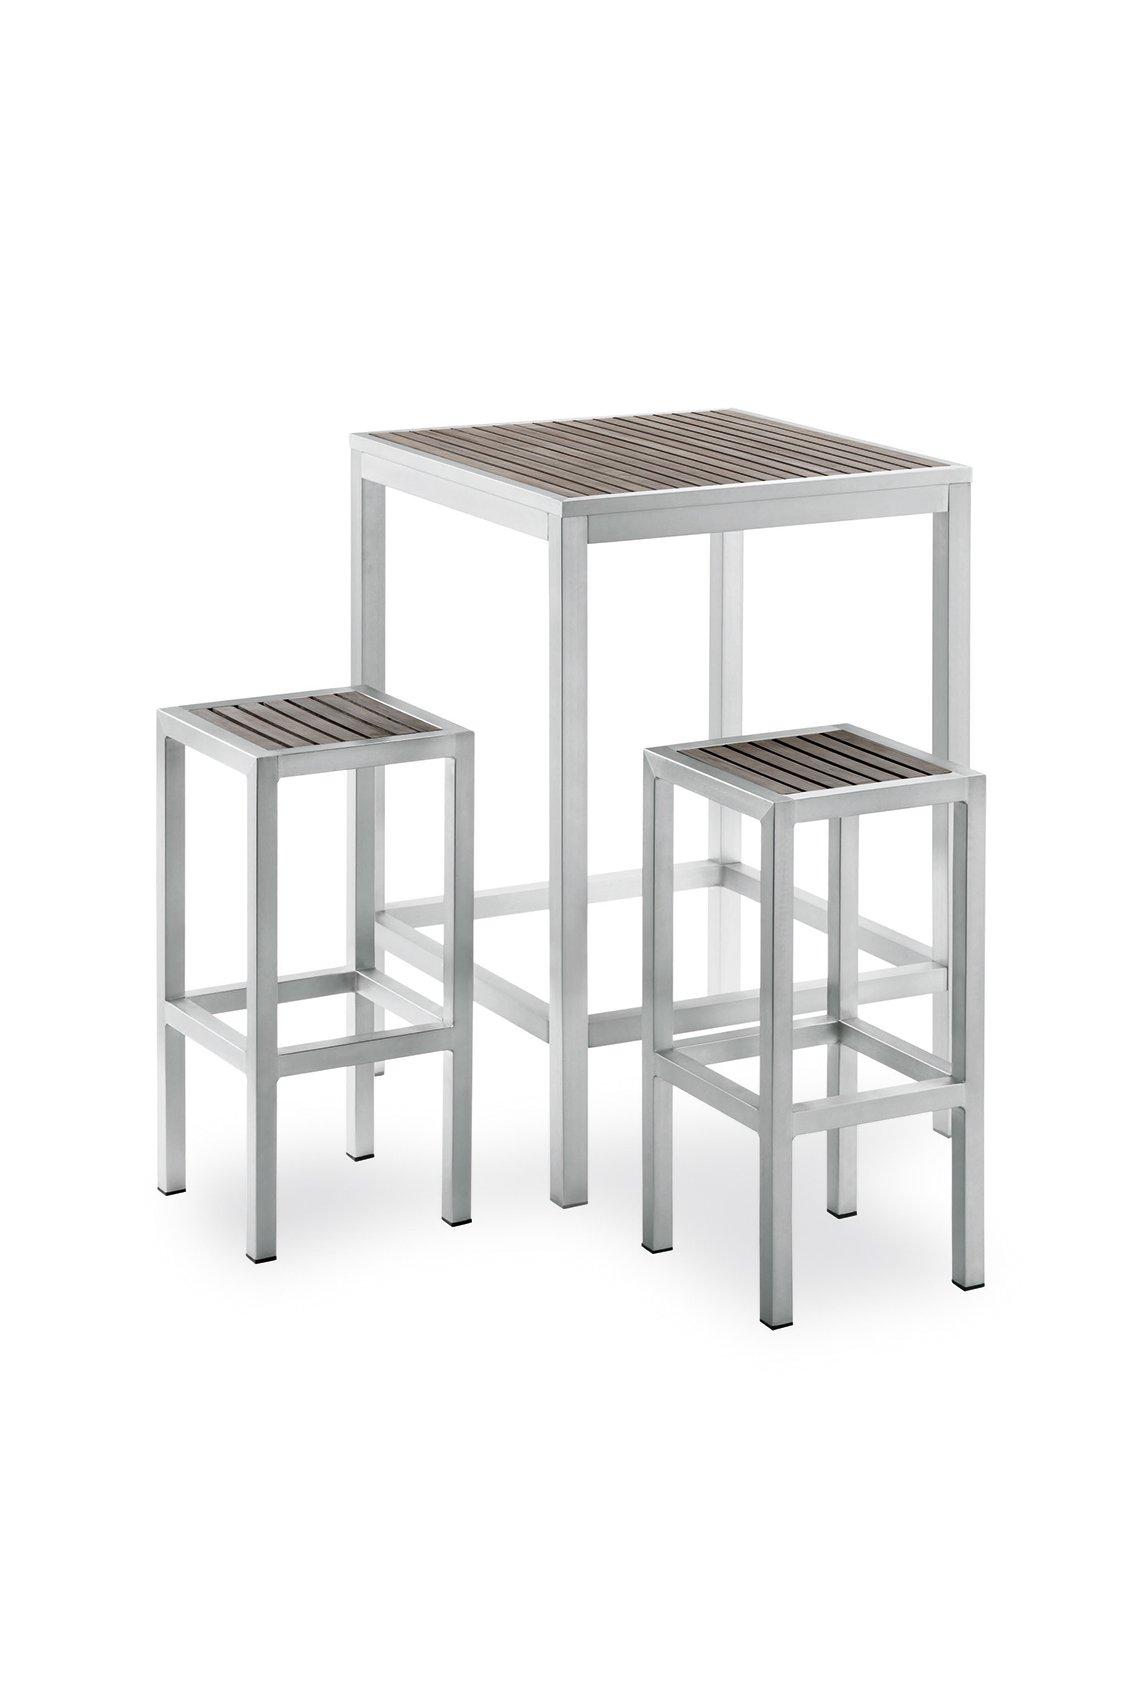 Barhocker Outdoor table model bavaria bar 873t thöni stühle barhocker tische